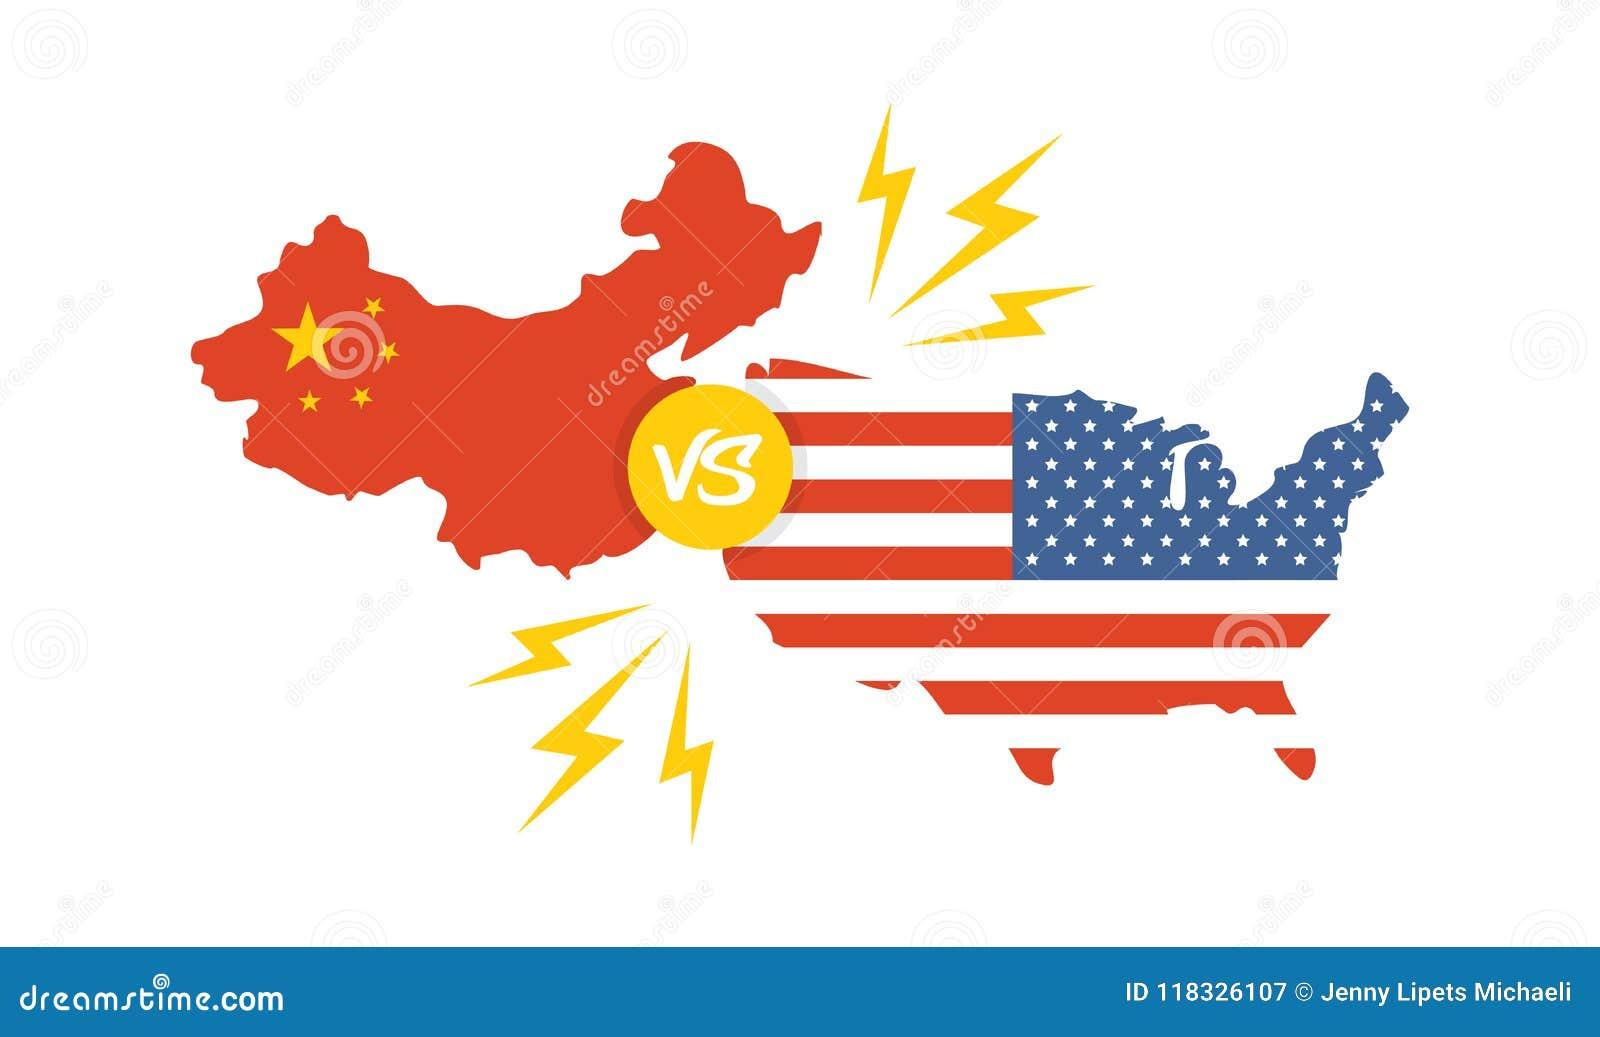 Guerra comercial, international global del intercambio del negocio de la tarifa de América China Los E.E.U.U. contra China